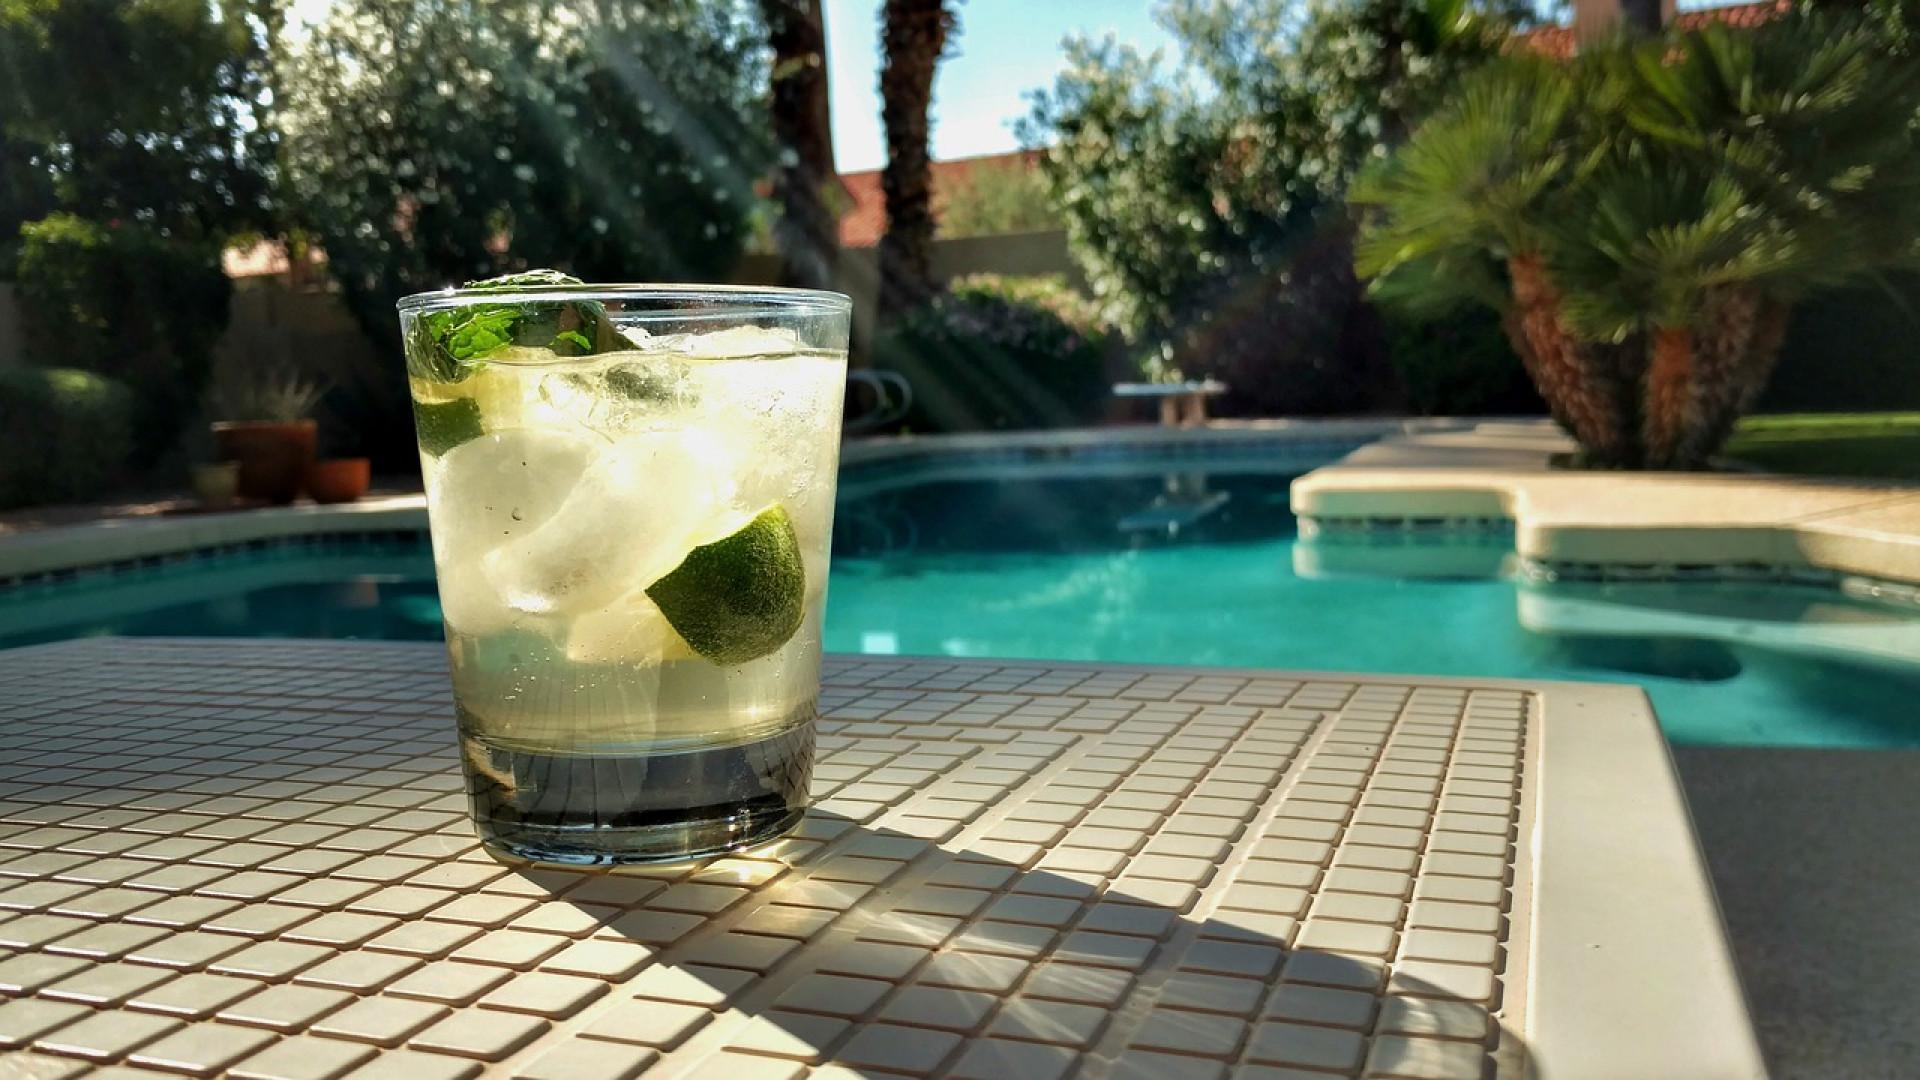 Pourquoi adopter un abri piscine ?